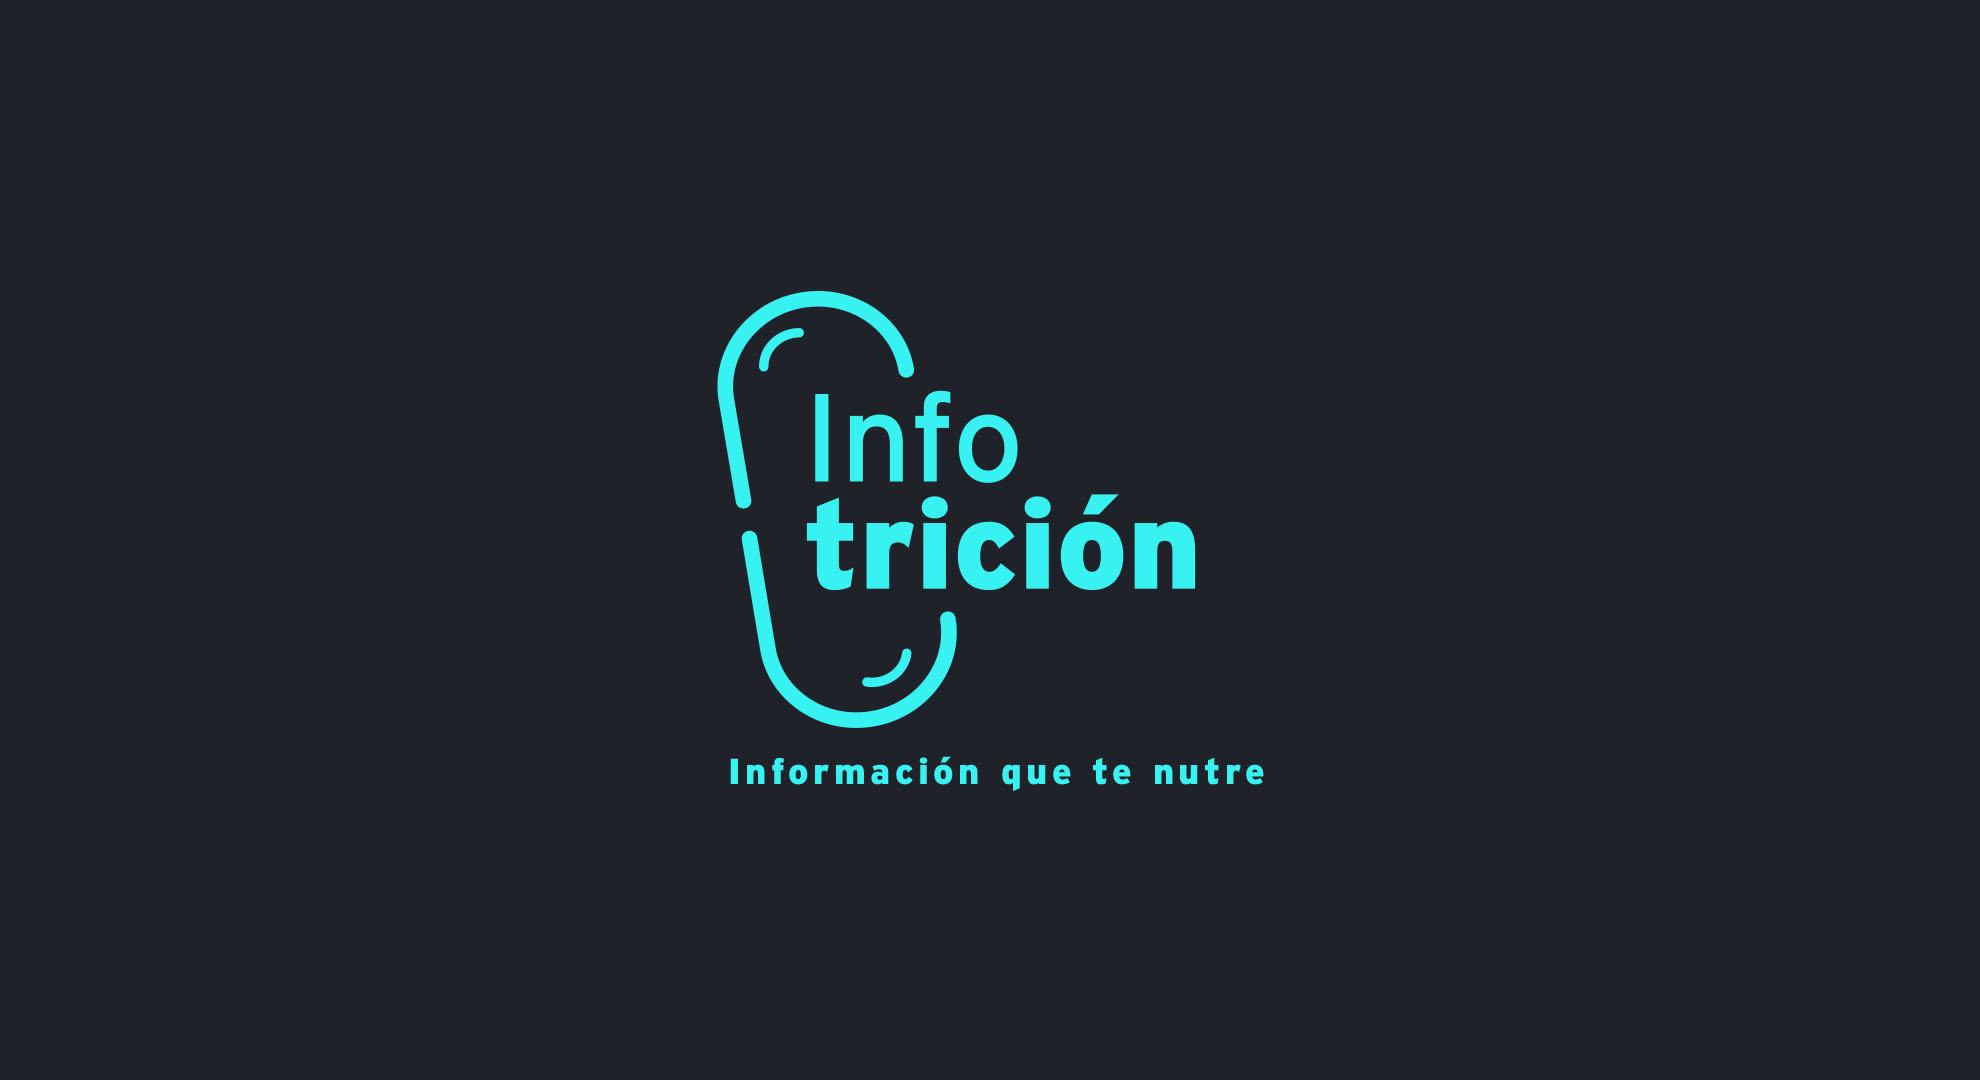 Medios de América Latina lanzan extensión de navegador para combatir la desinformación